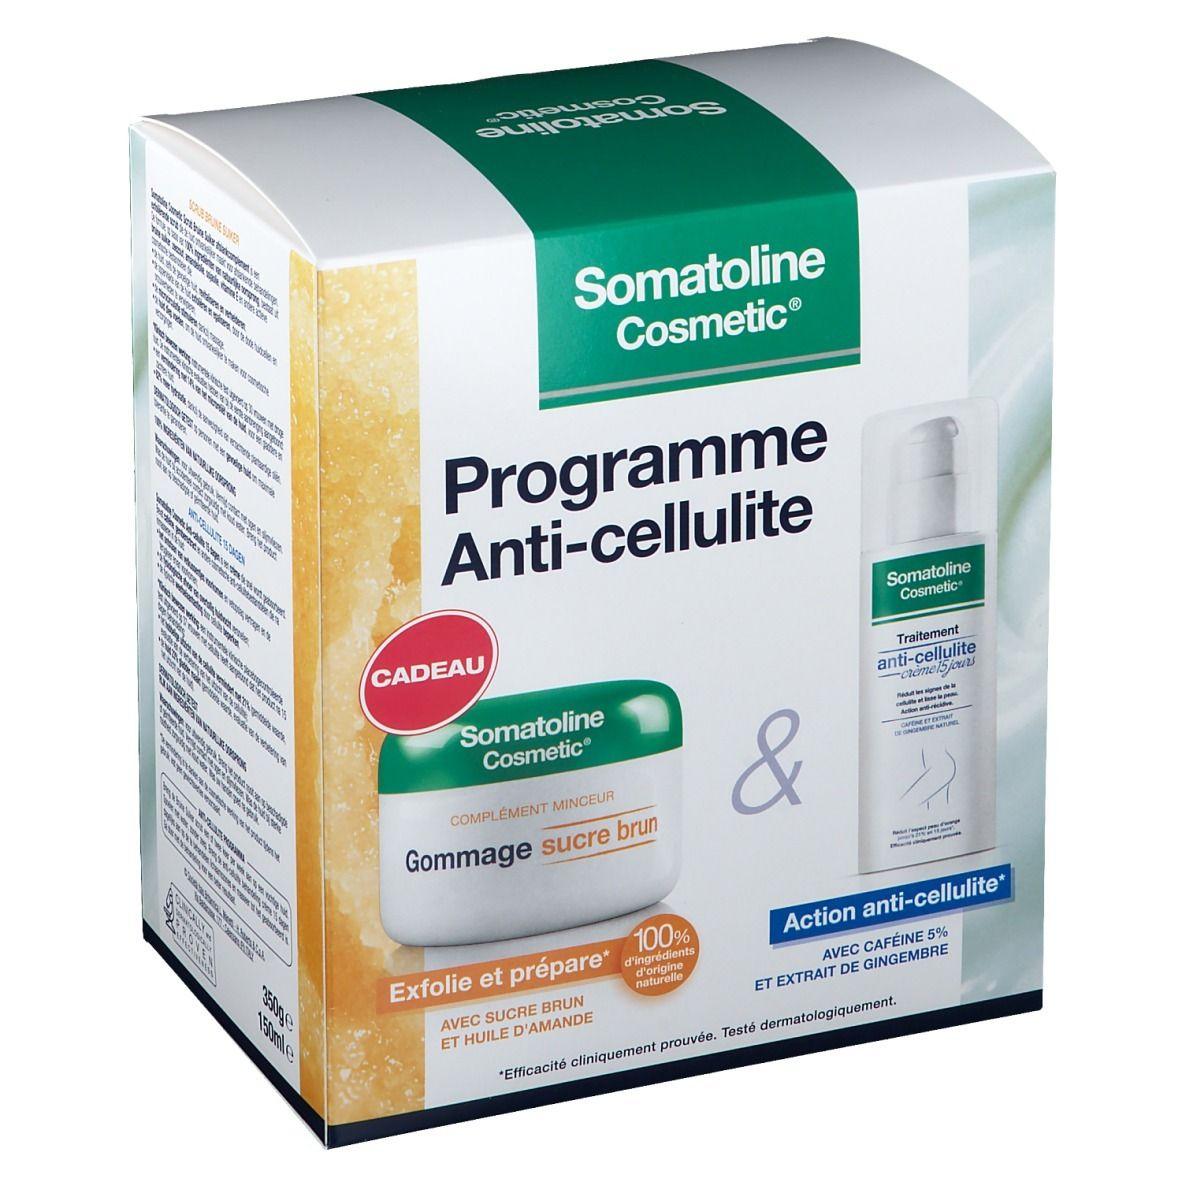 Somatoline Cosmetic® Programme Anti-Cellulite Crème 15 jours + Gommage sucre brun pc(s) set(s)